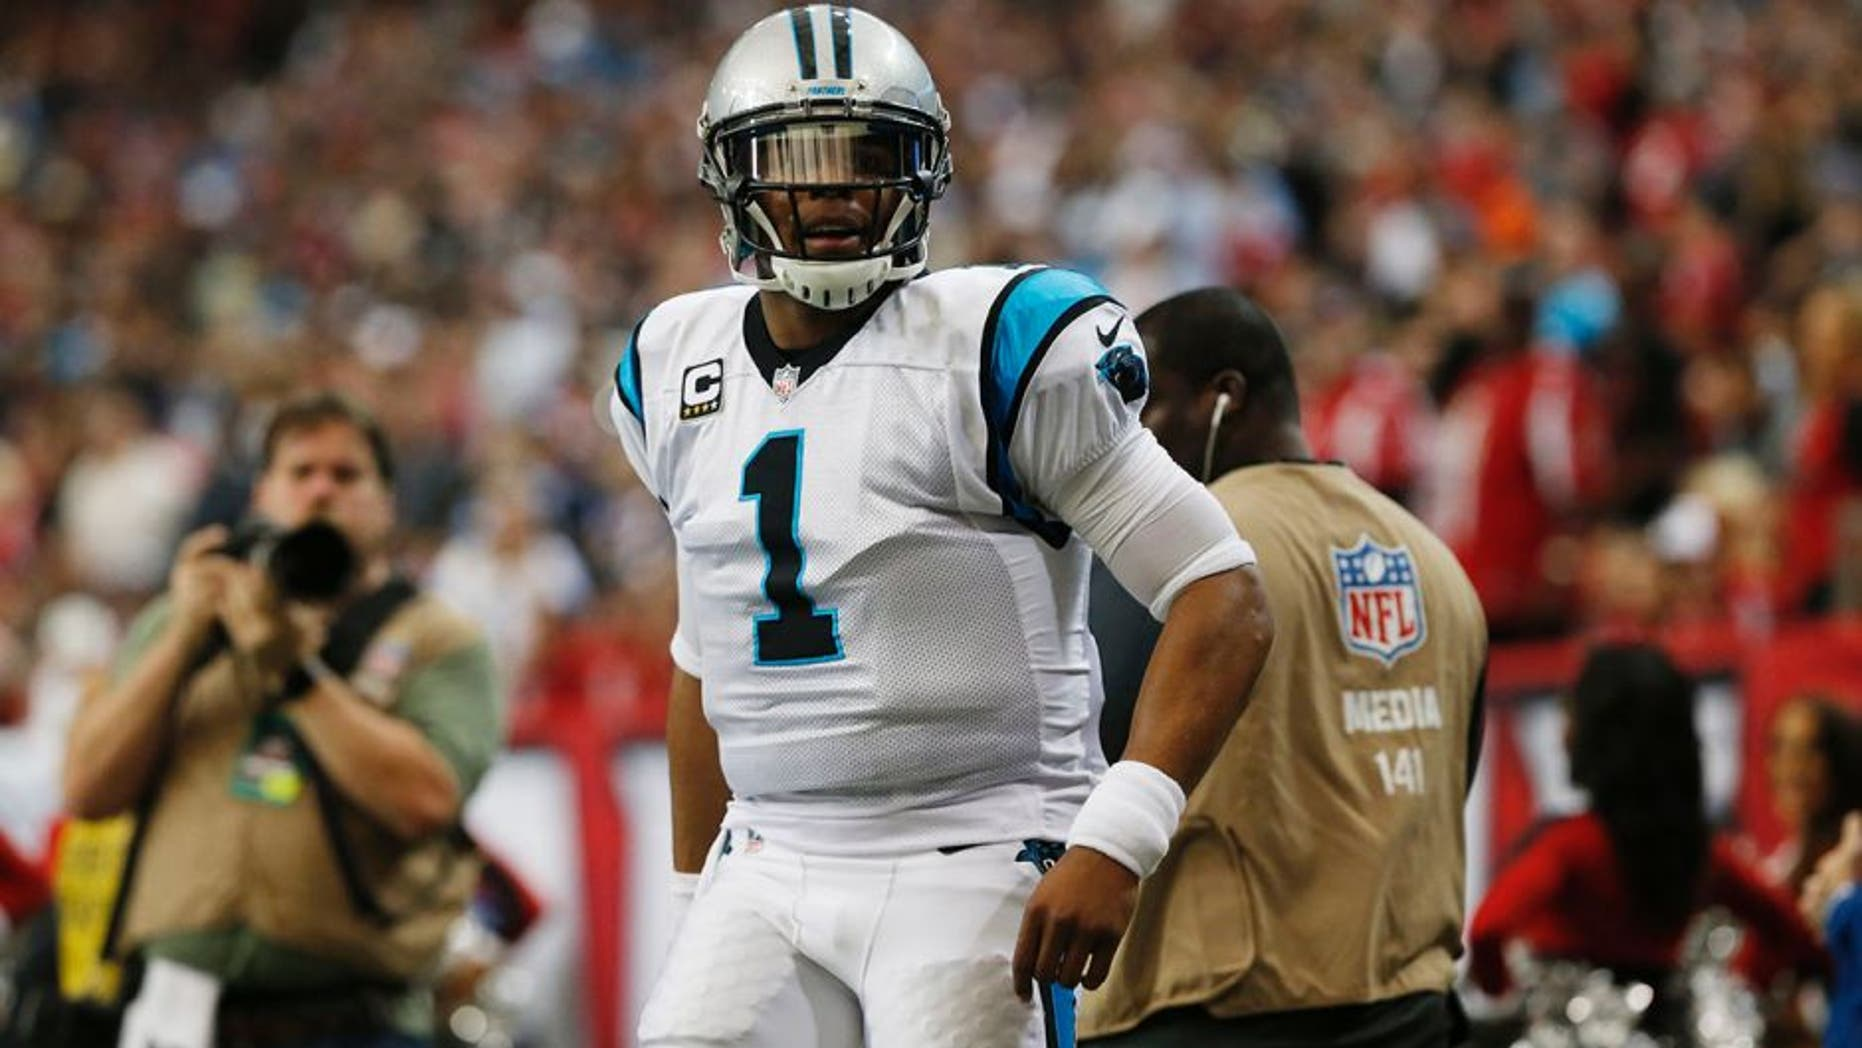 Carolina Panthers quarterback Cam Newton (1) reacts to a run against the Atlanta Falcons during the first half of an NFL football game, Sunday, Dec. 27, 2015, in Atlanta. (AP Photo/John Bazemore)